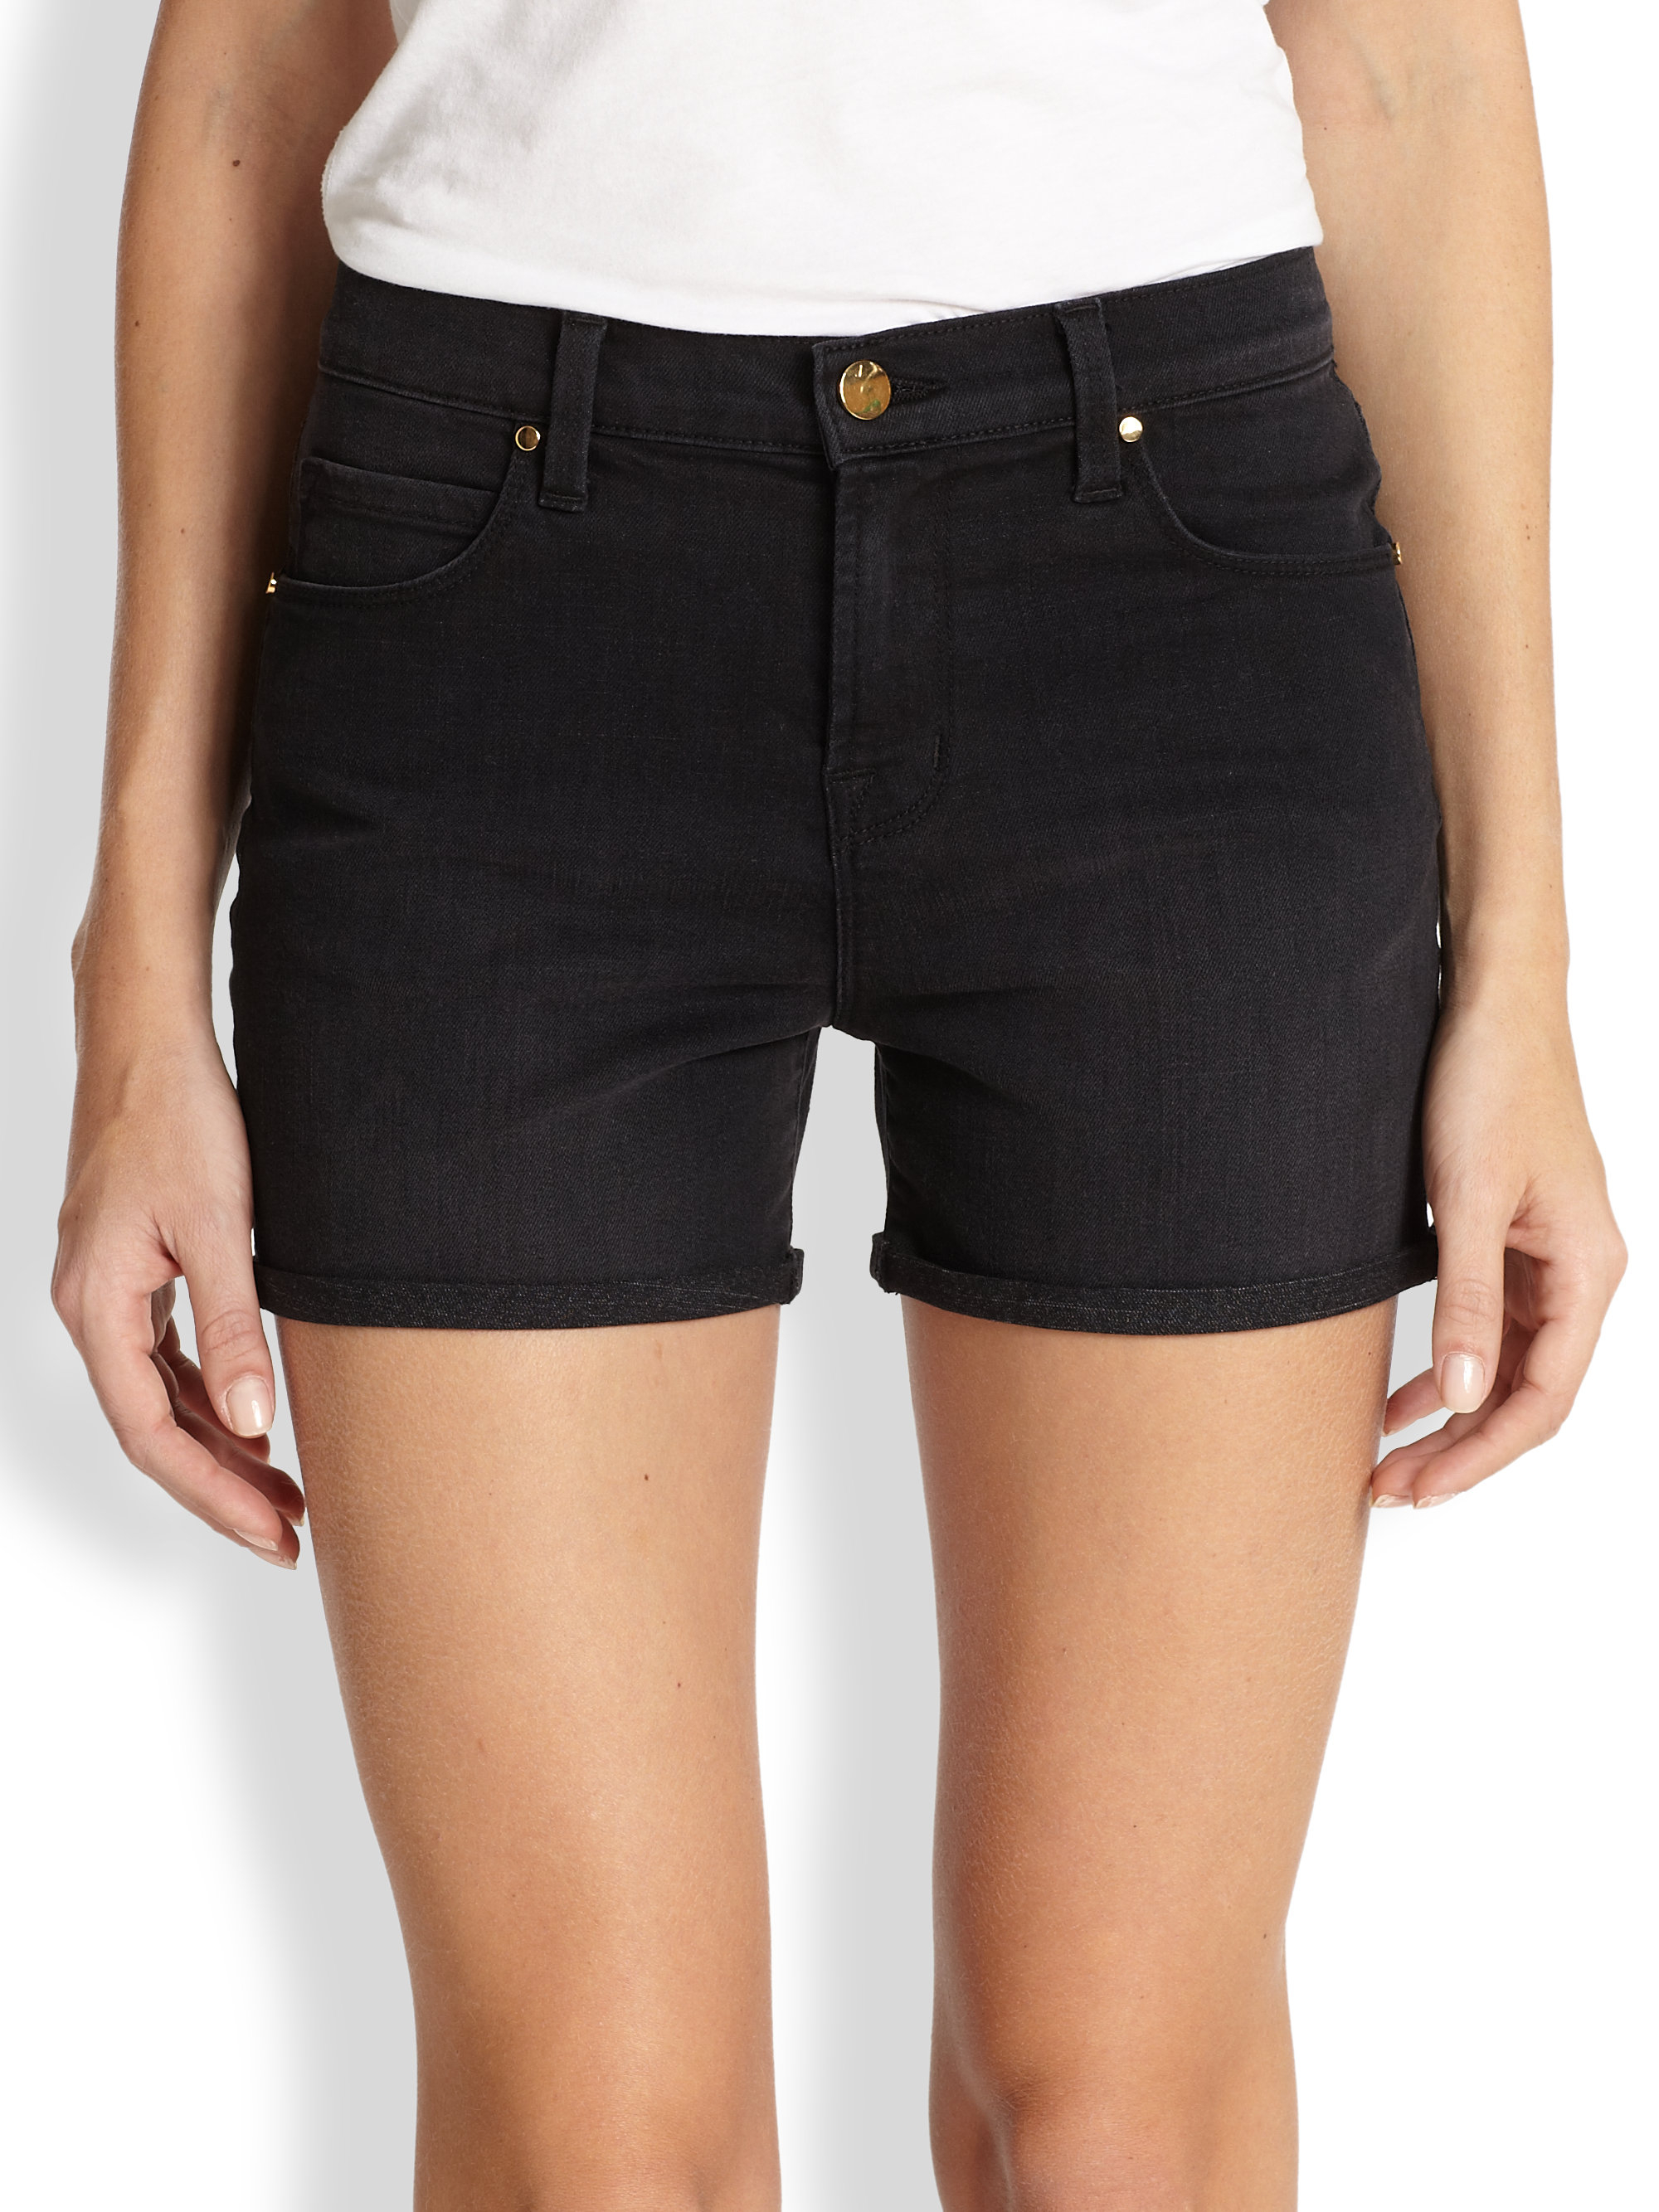 J brand Leigh High-Rise Denim Shorts in Black | Lyst